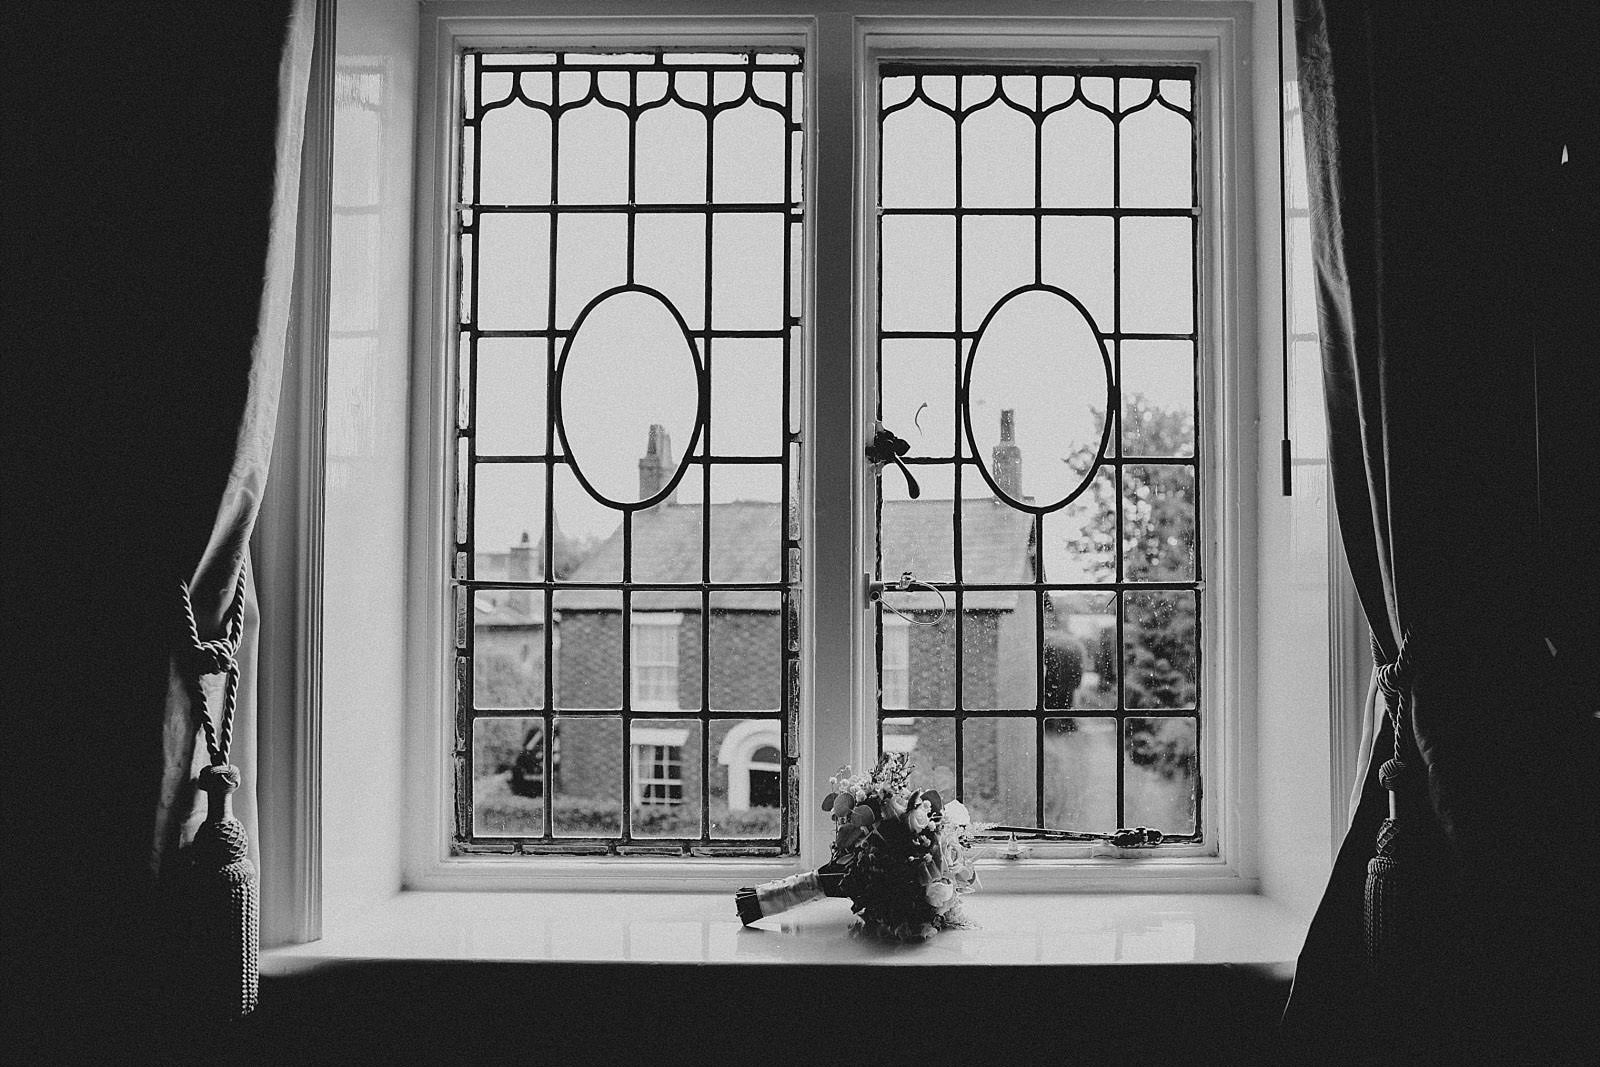 brides flowers sit on a window ledge